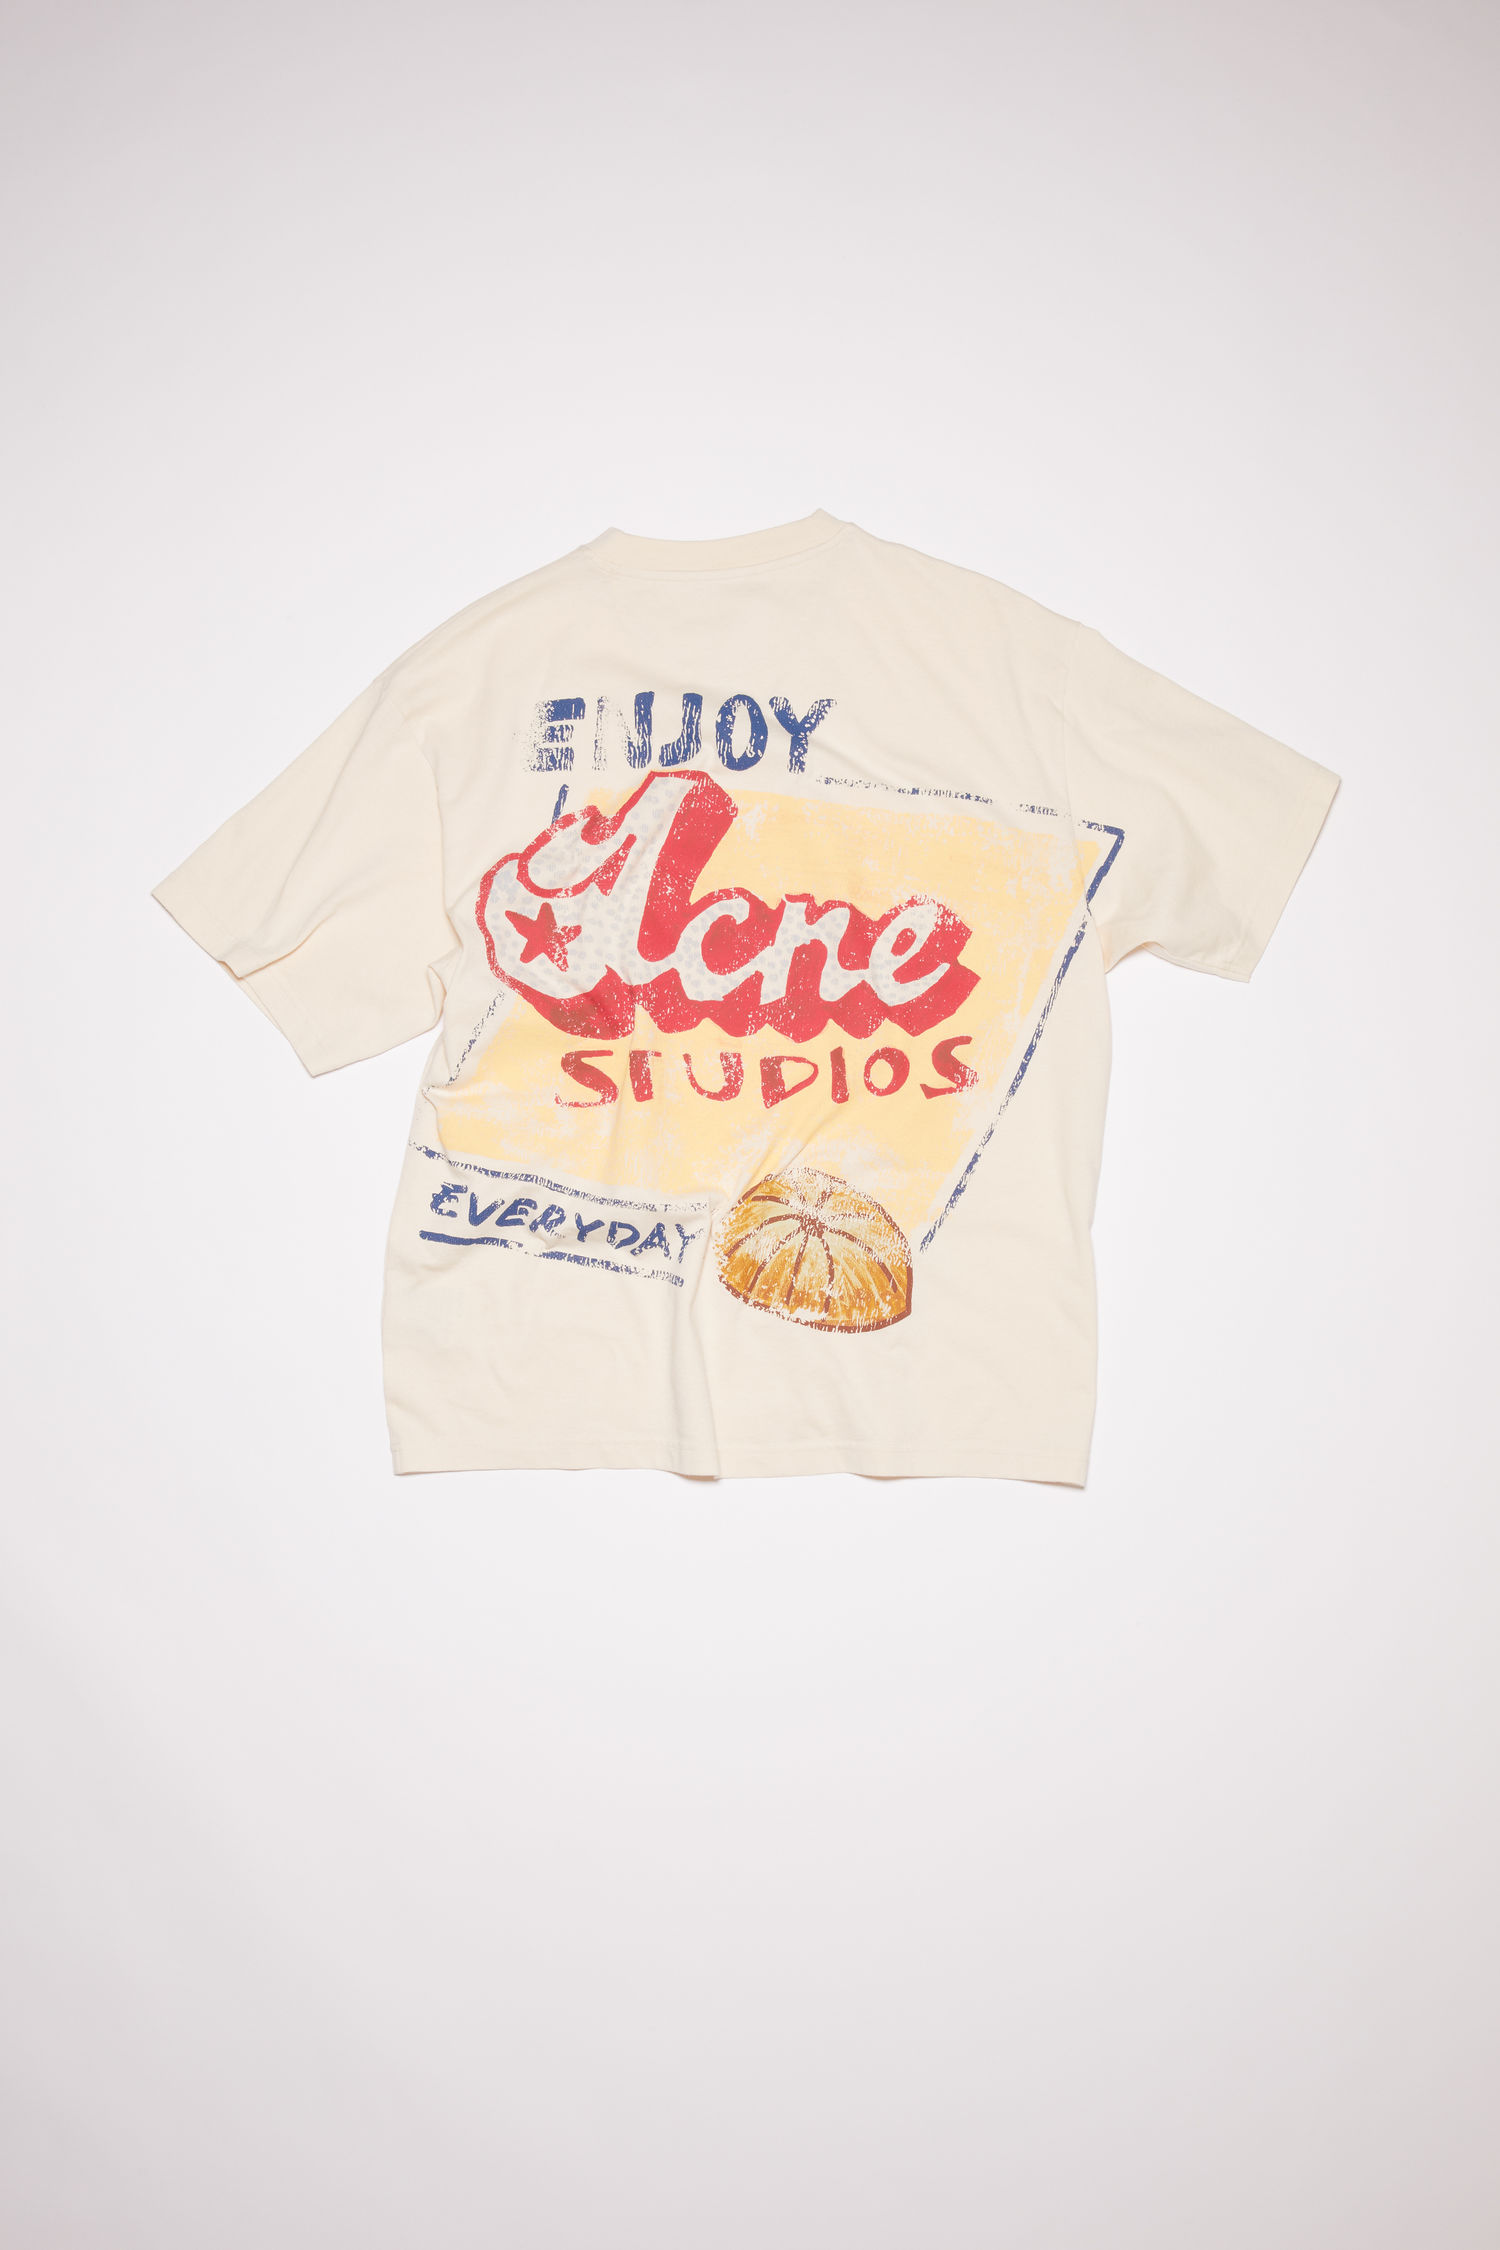 Acne Studios x Grant Levy-Lucero